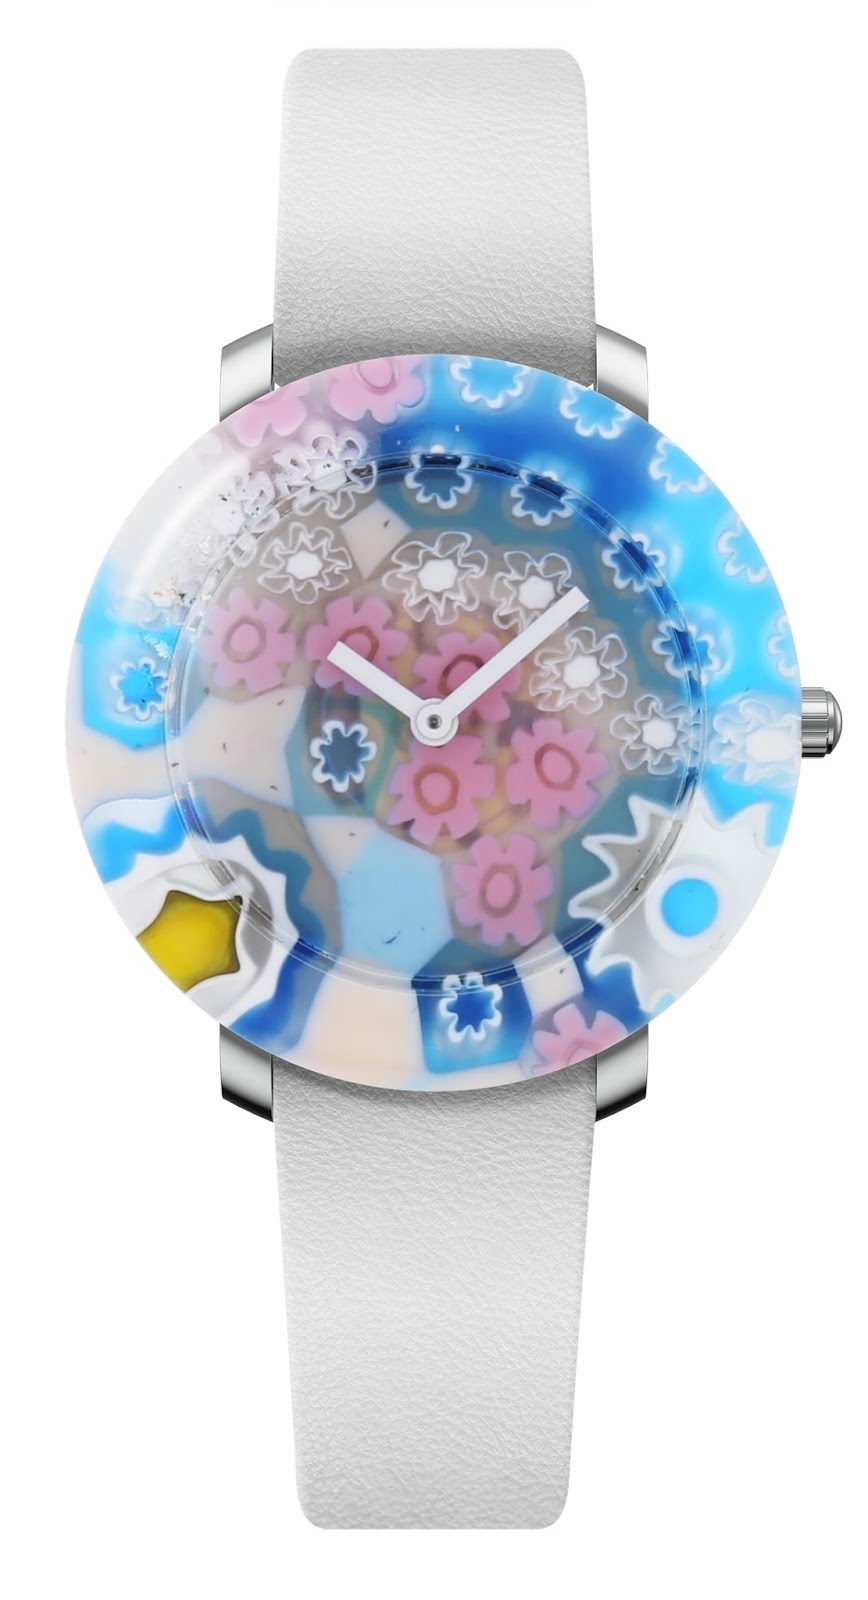 The ART of TIME: YUNIK